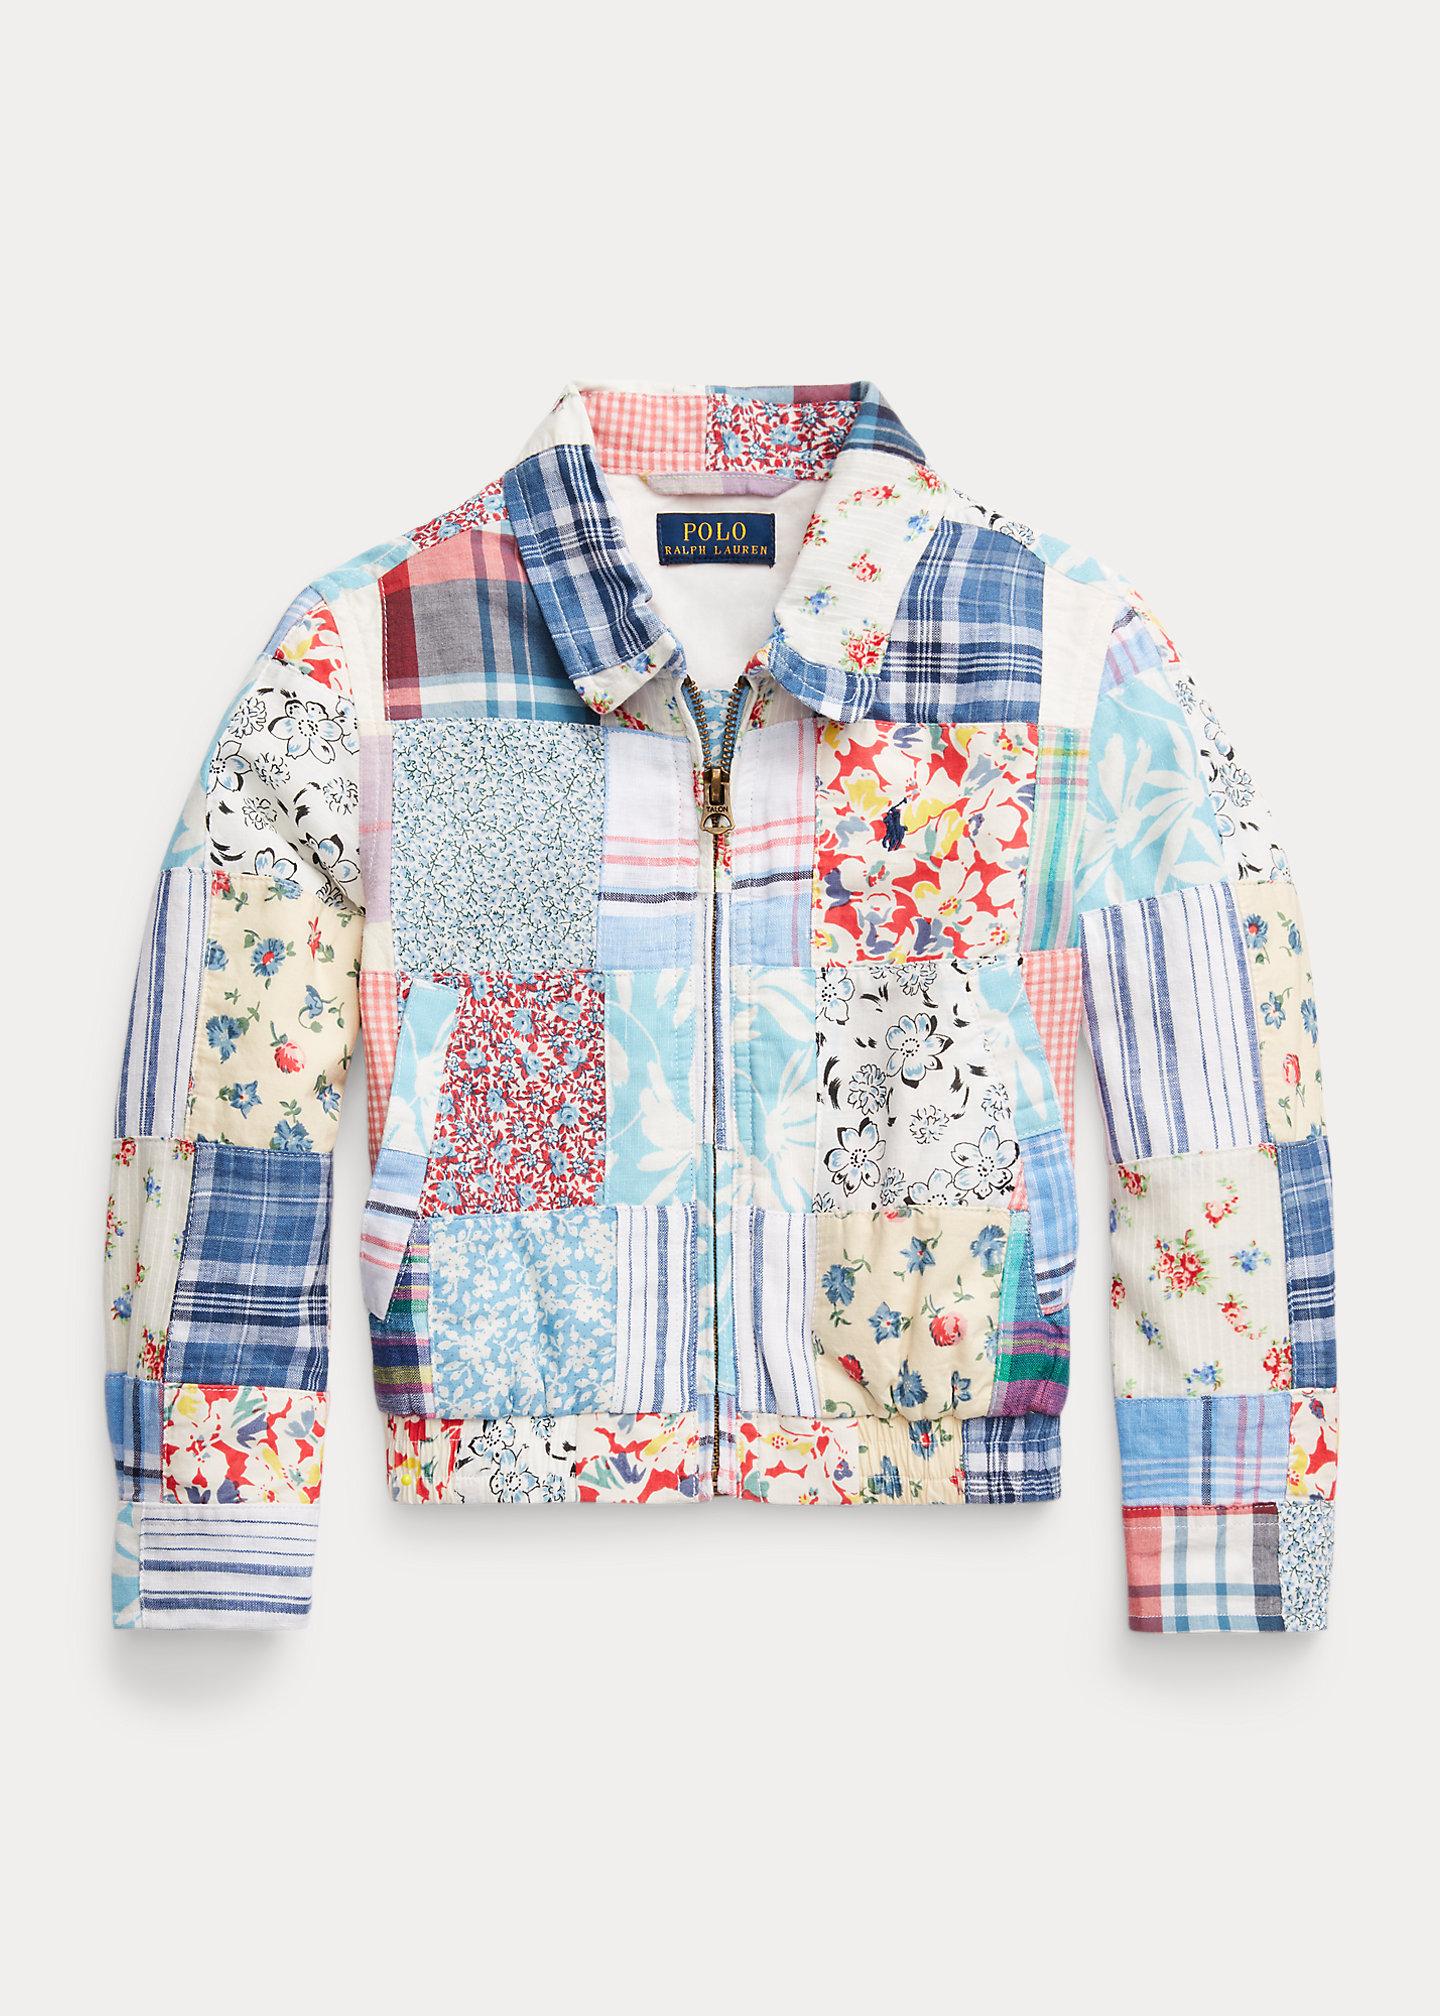 Polo Ralph Lauren Patchwork Cotton Linen Jacket